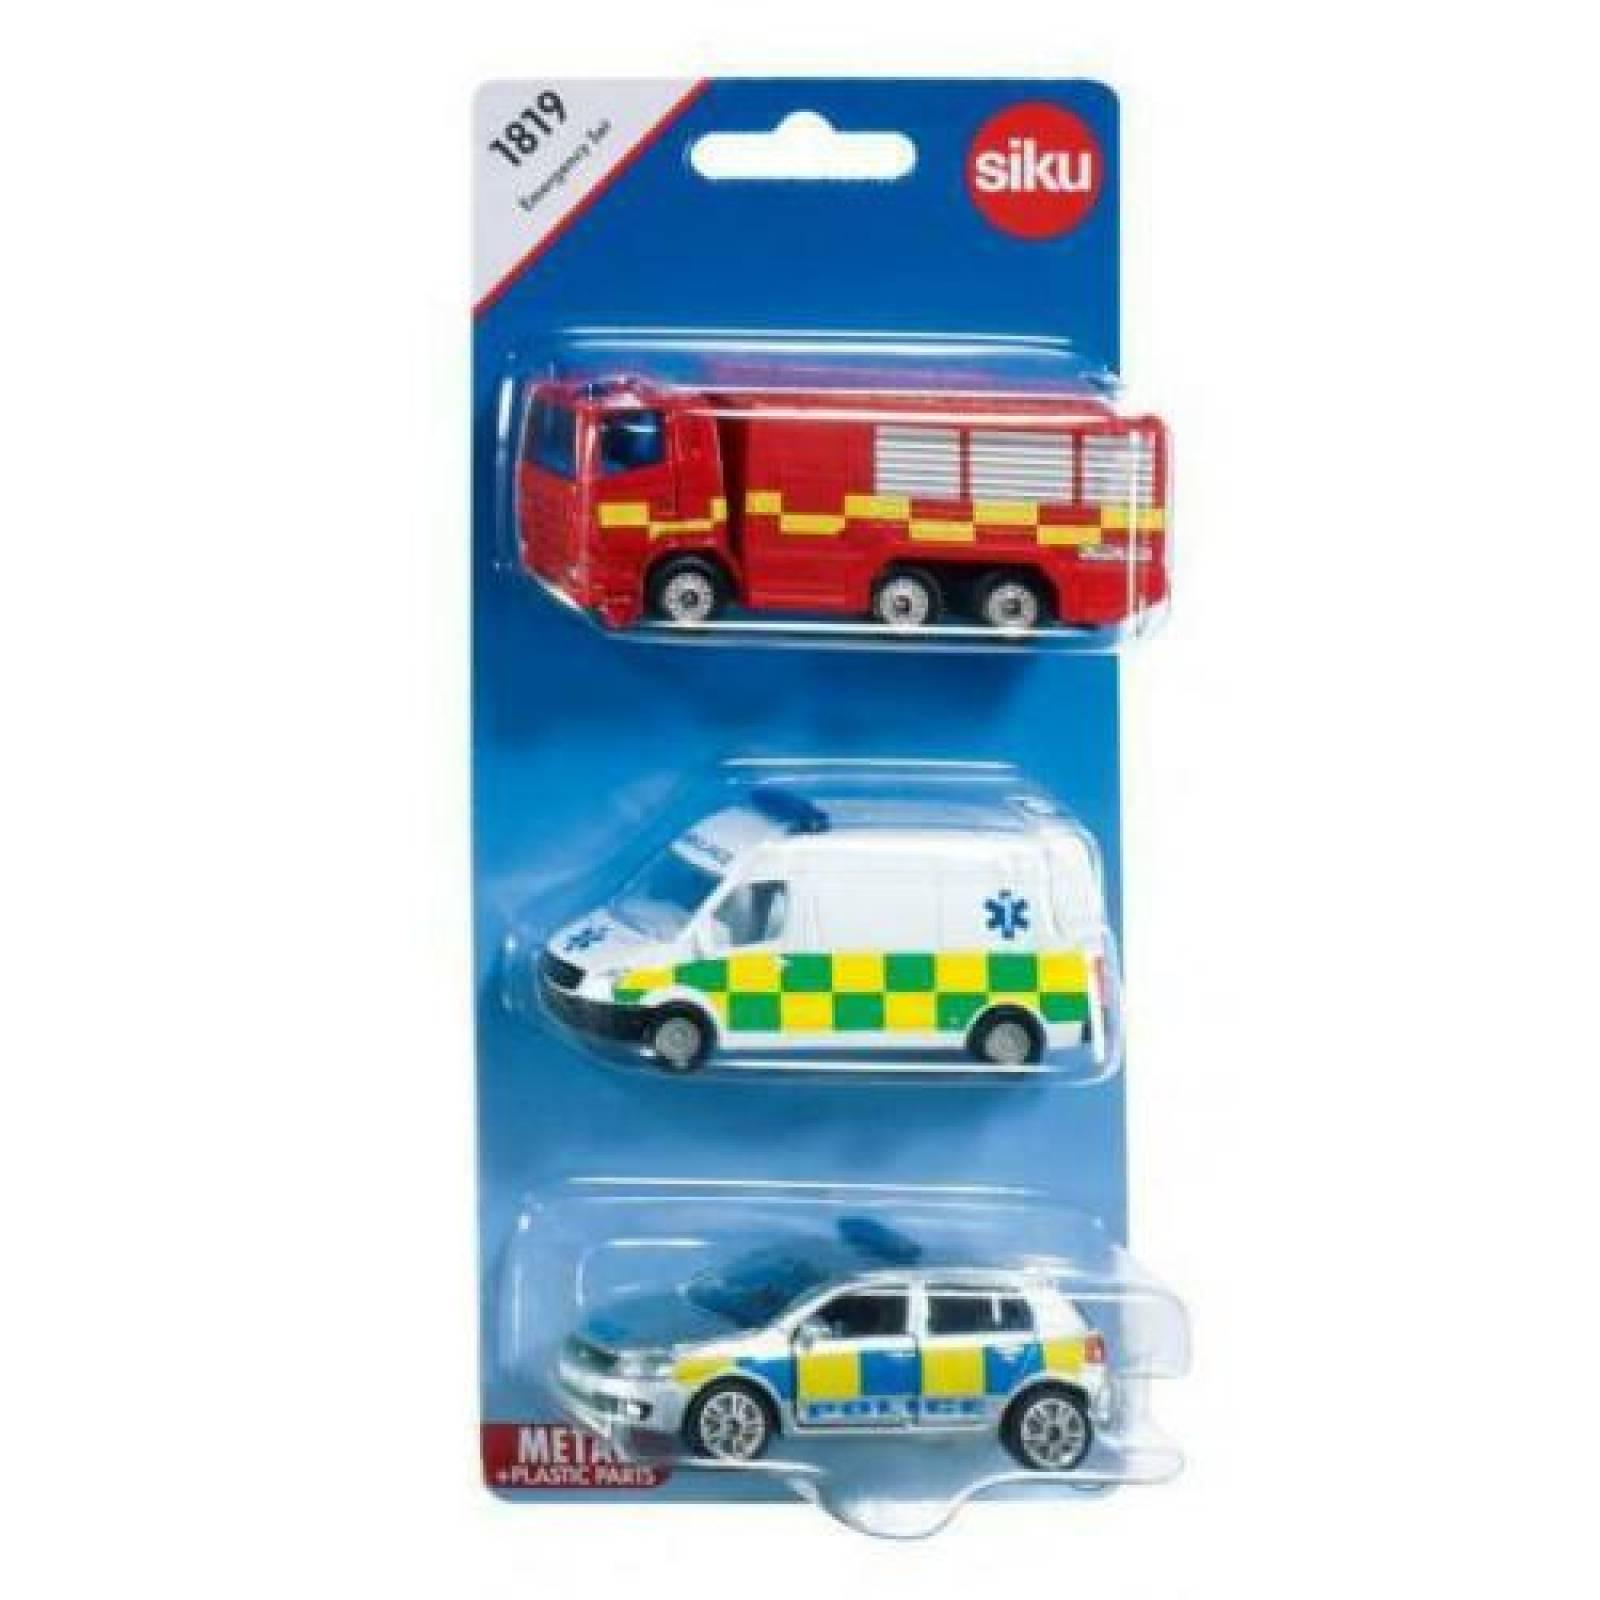 SIKU 3 Car Emergency Vehicle Set thumbnails